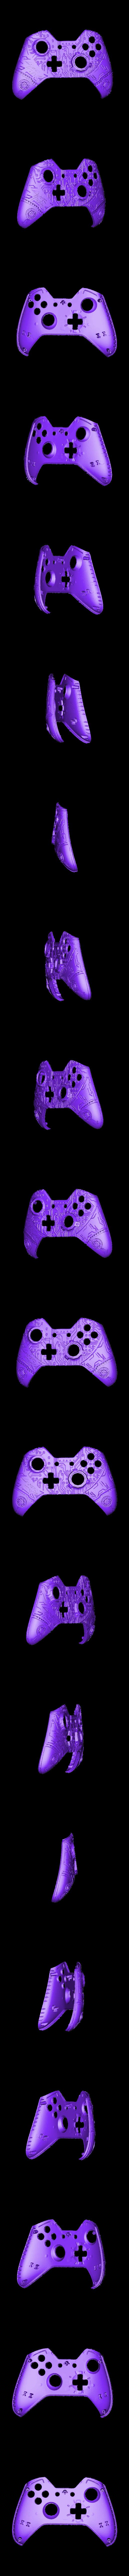 XBONE_CP.stl Download free STL file CyberPunk Xbox Controller Faceplate • Design to 3D print, Mehdals